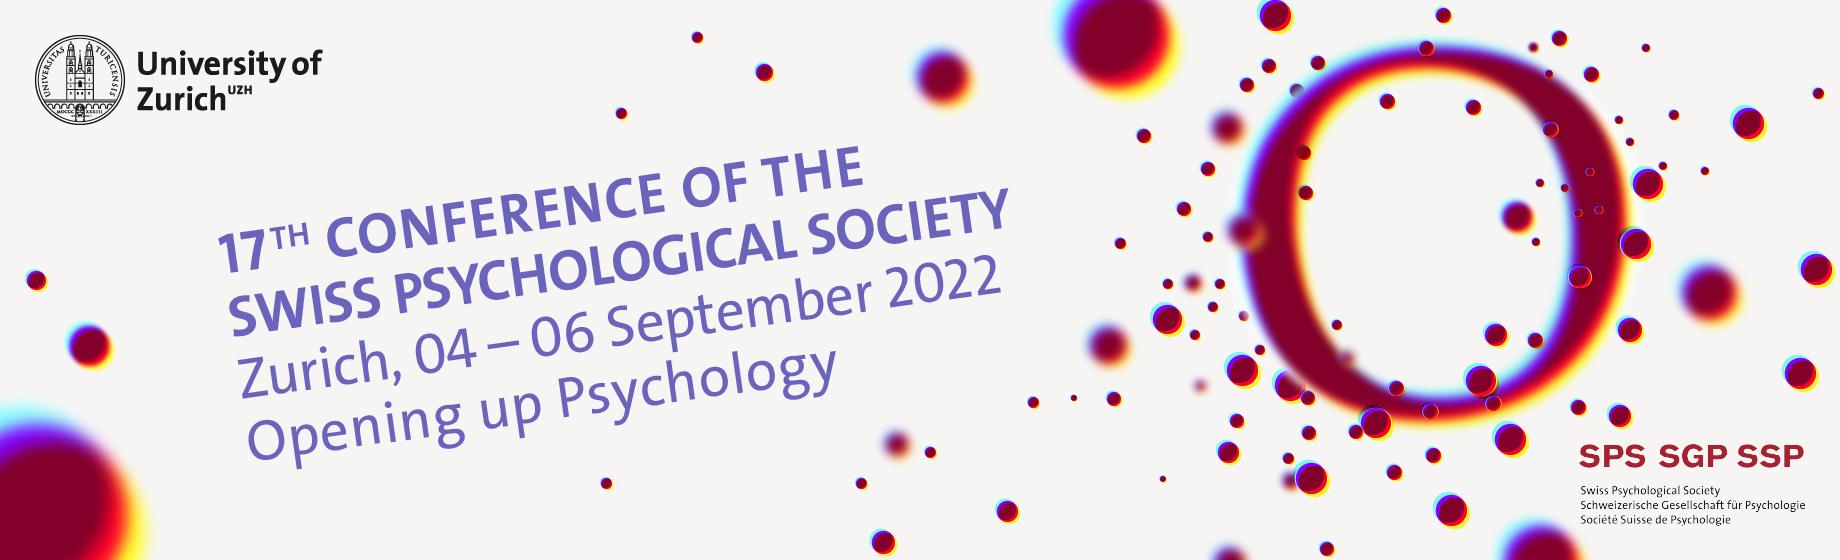 Swiss Psychological Society